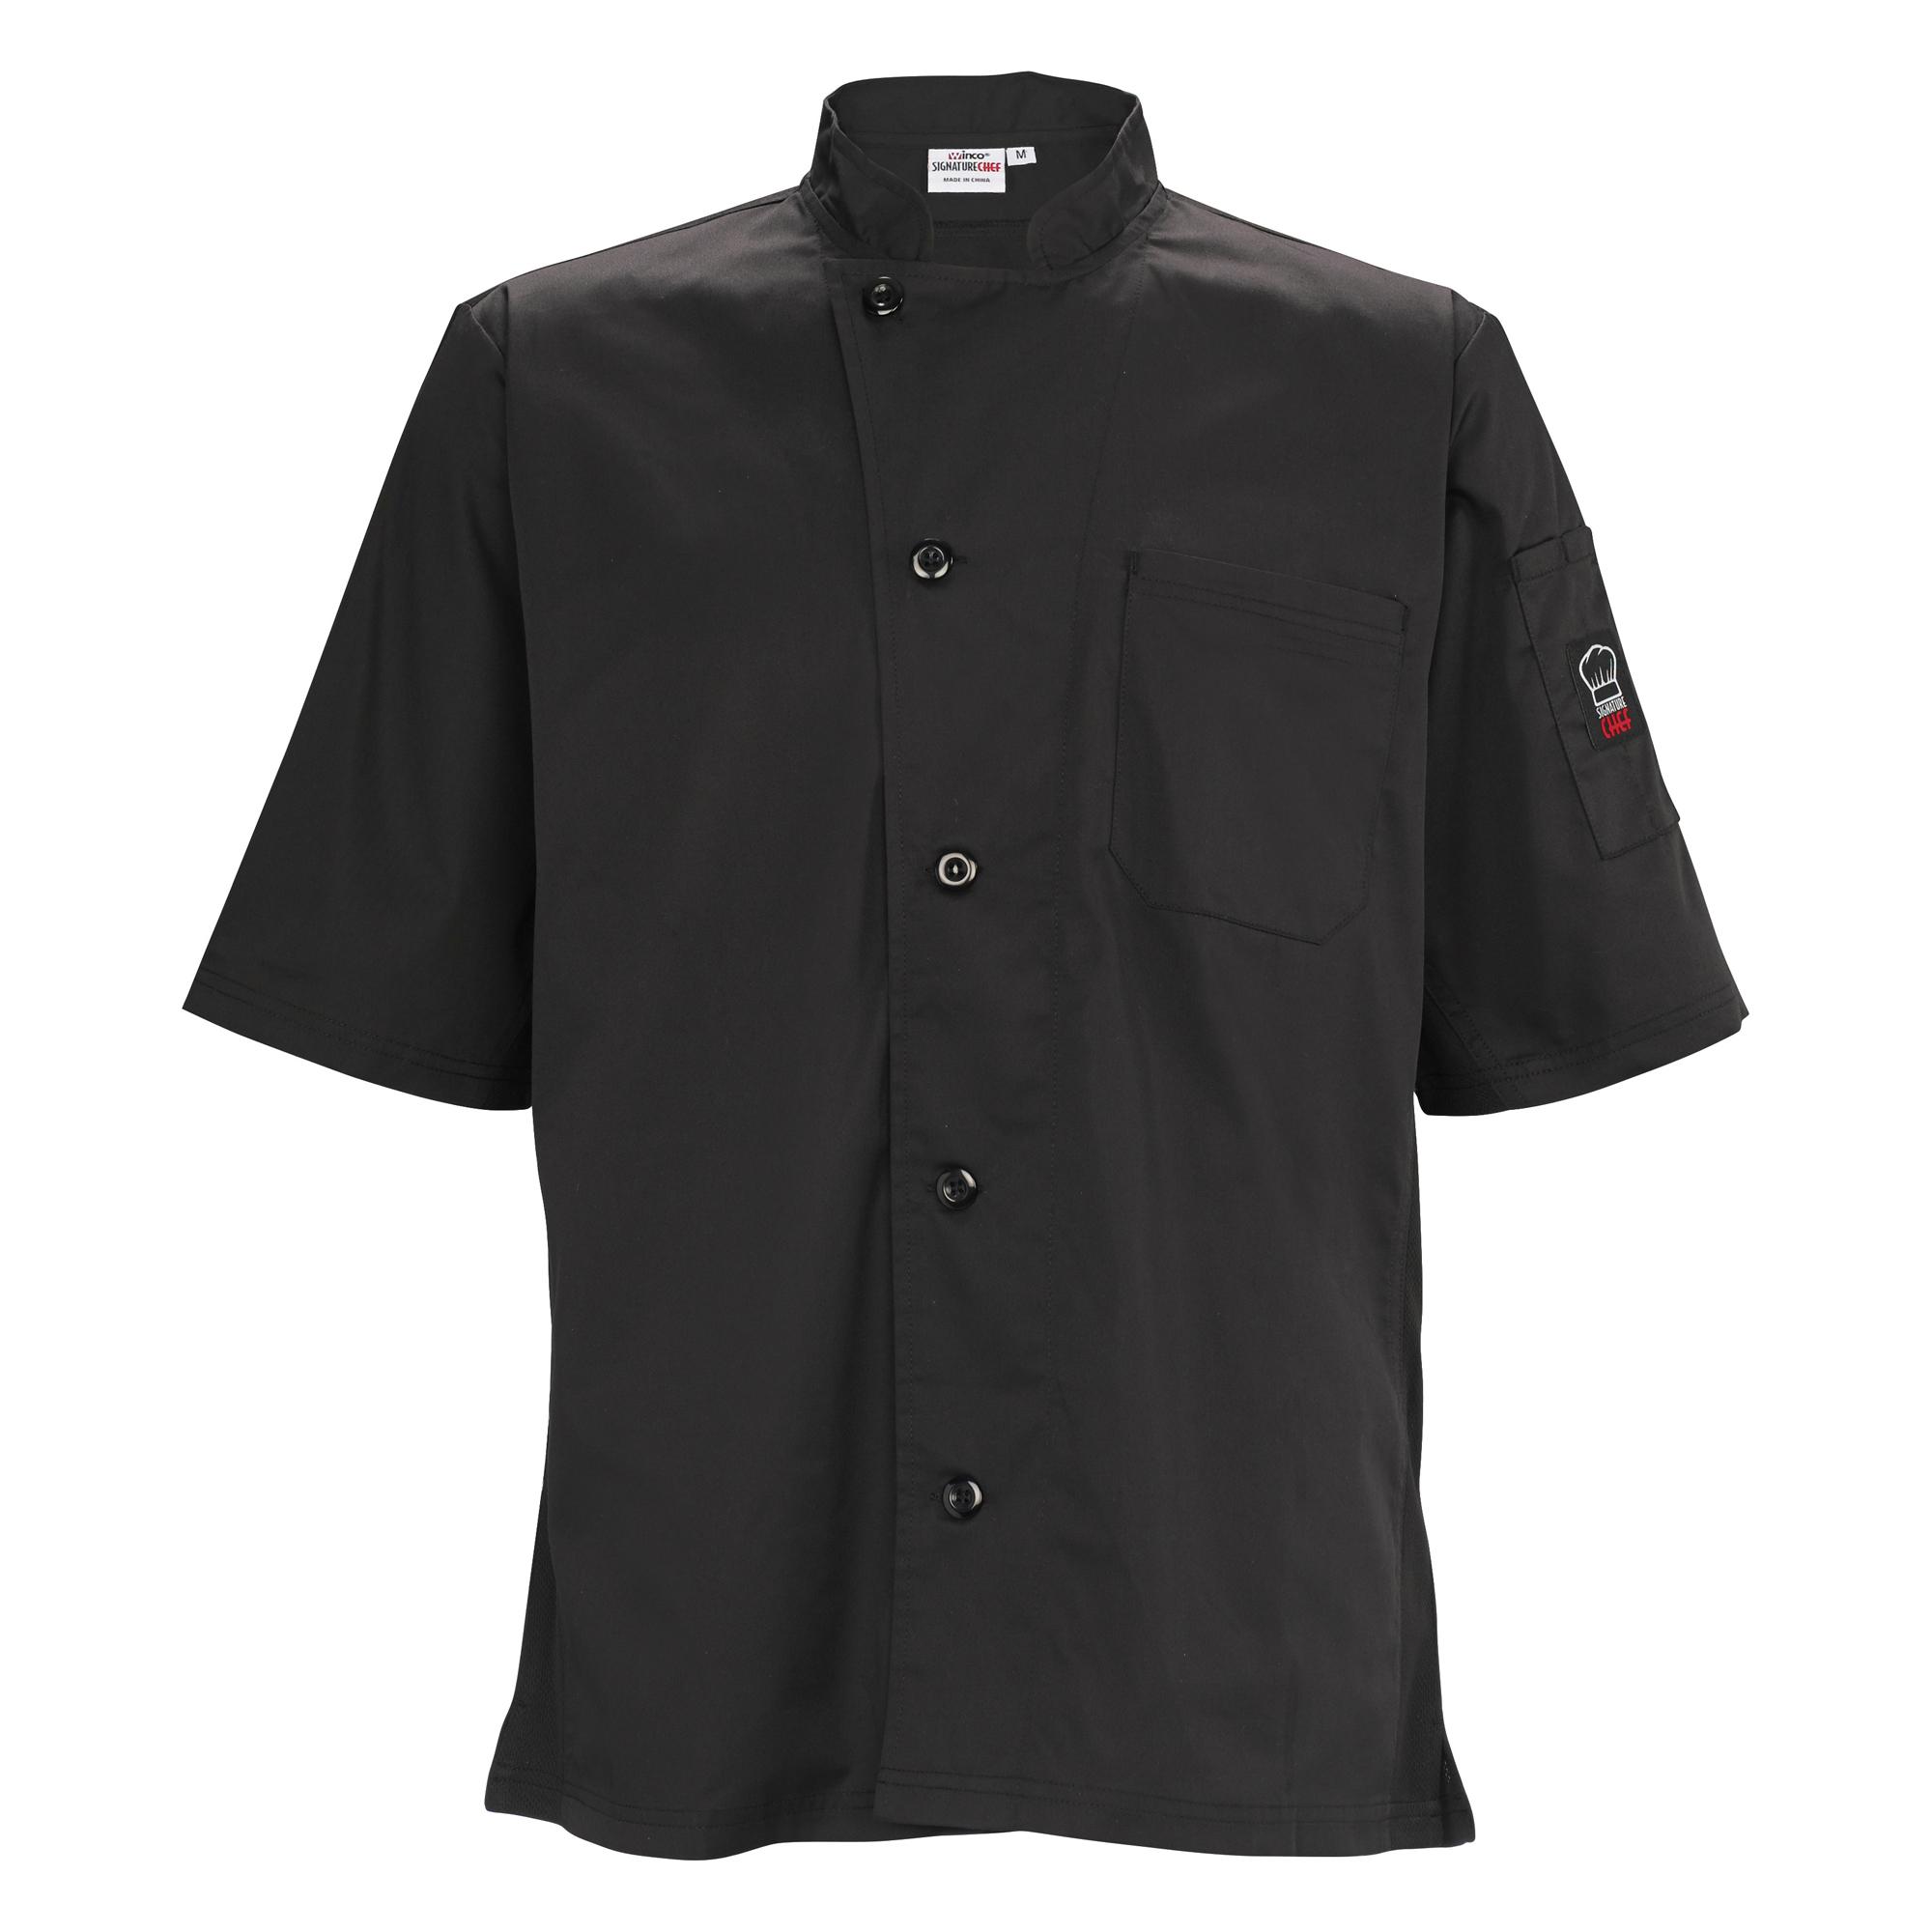 Winco UNF-9KM cook's shirt